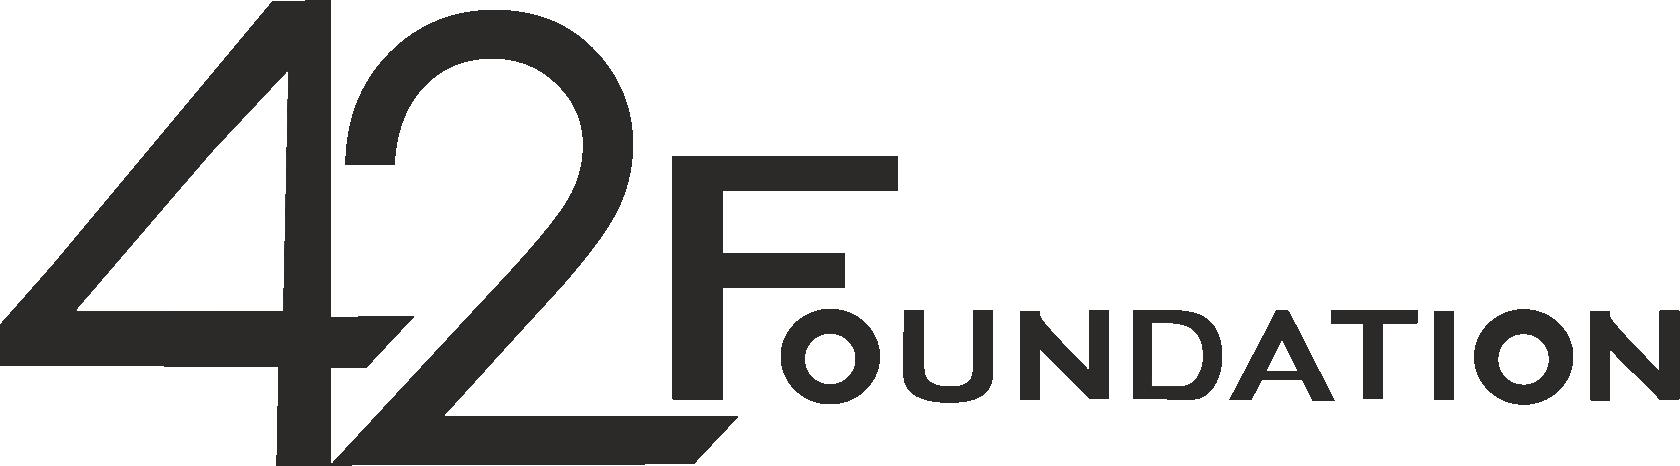 42 Foundation